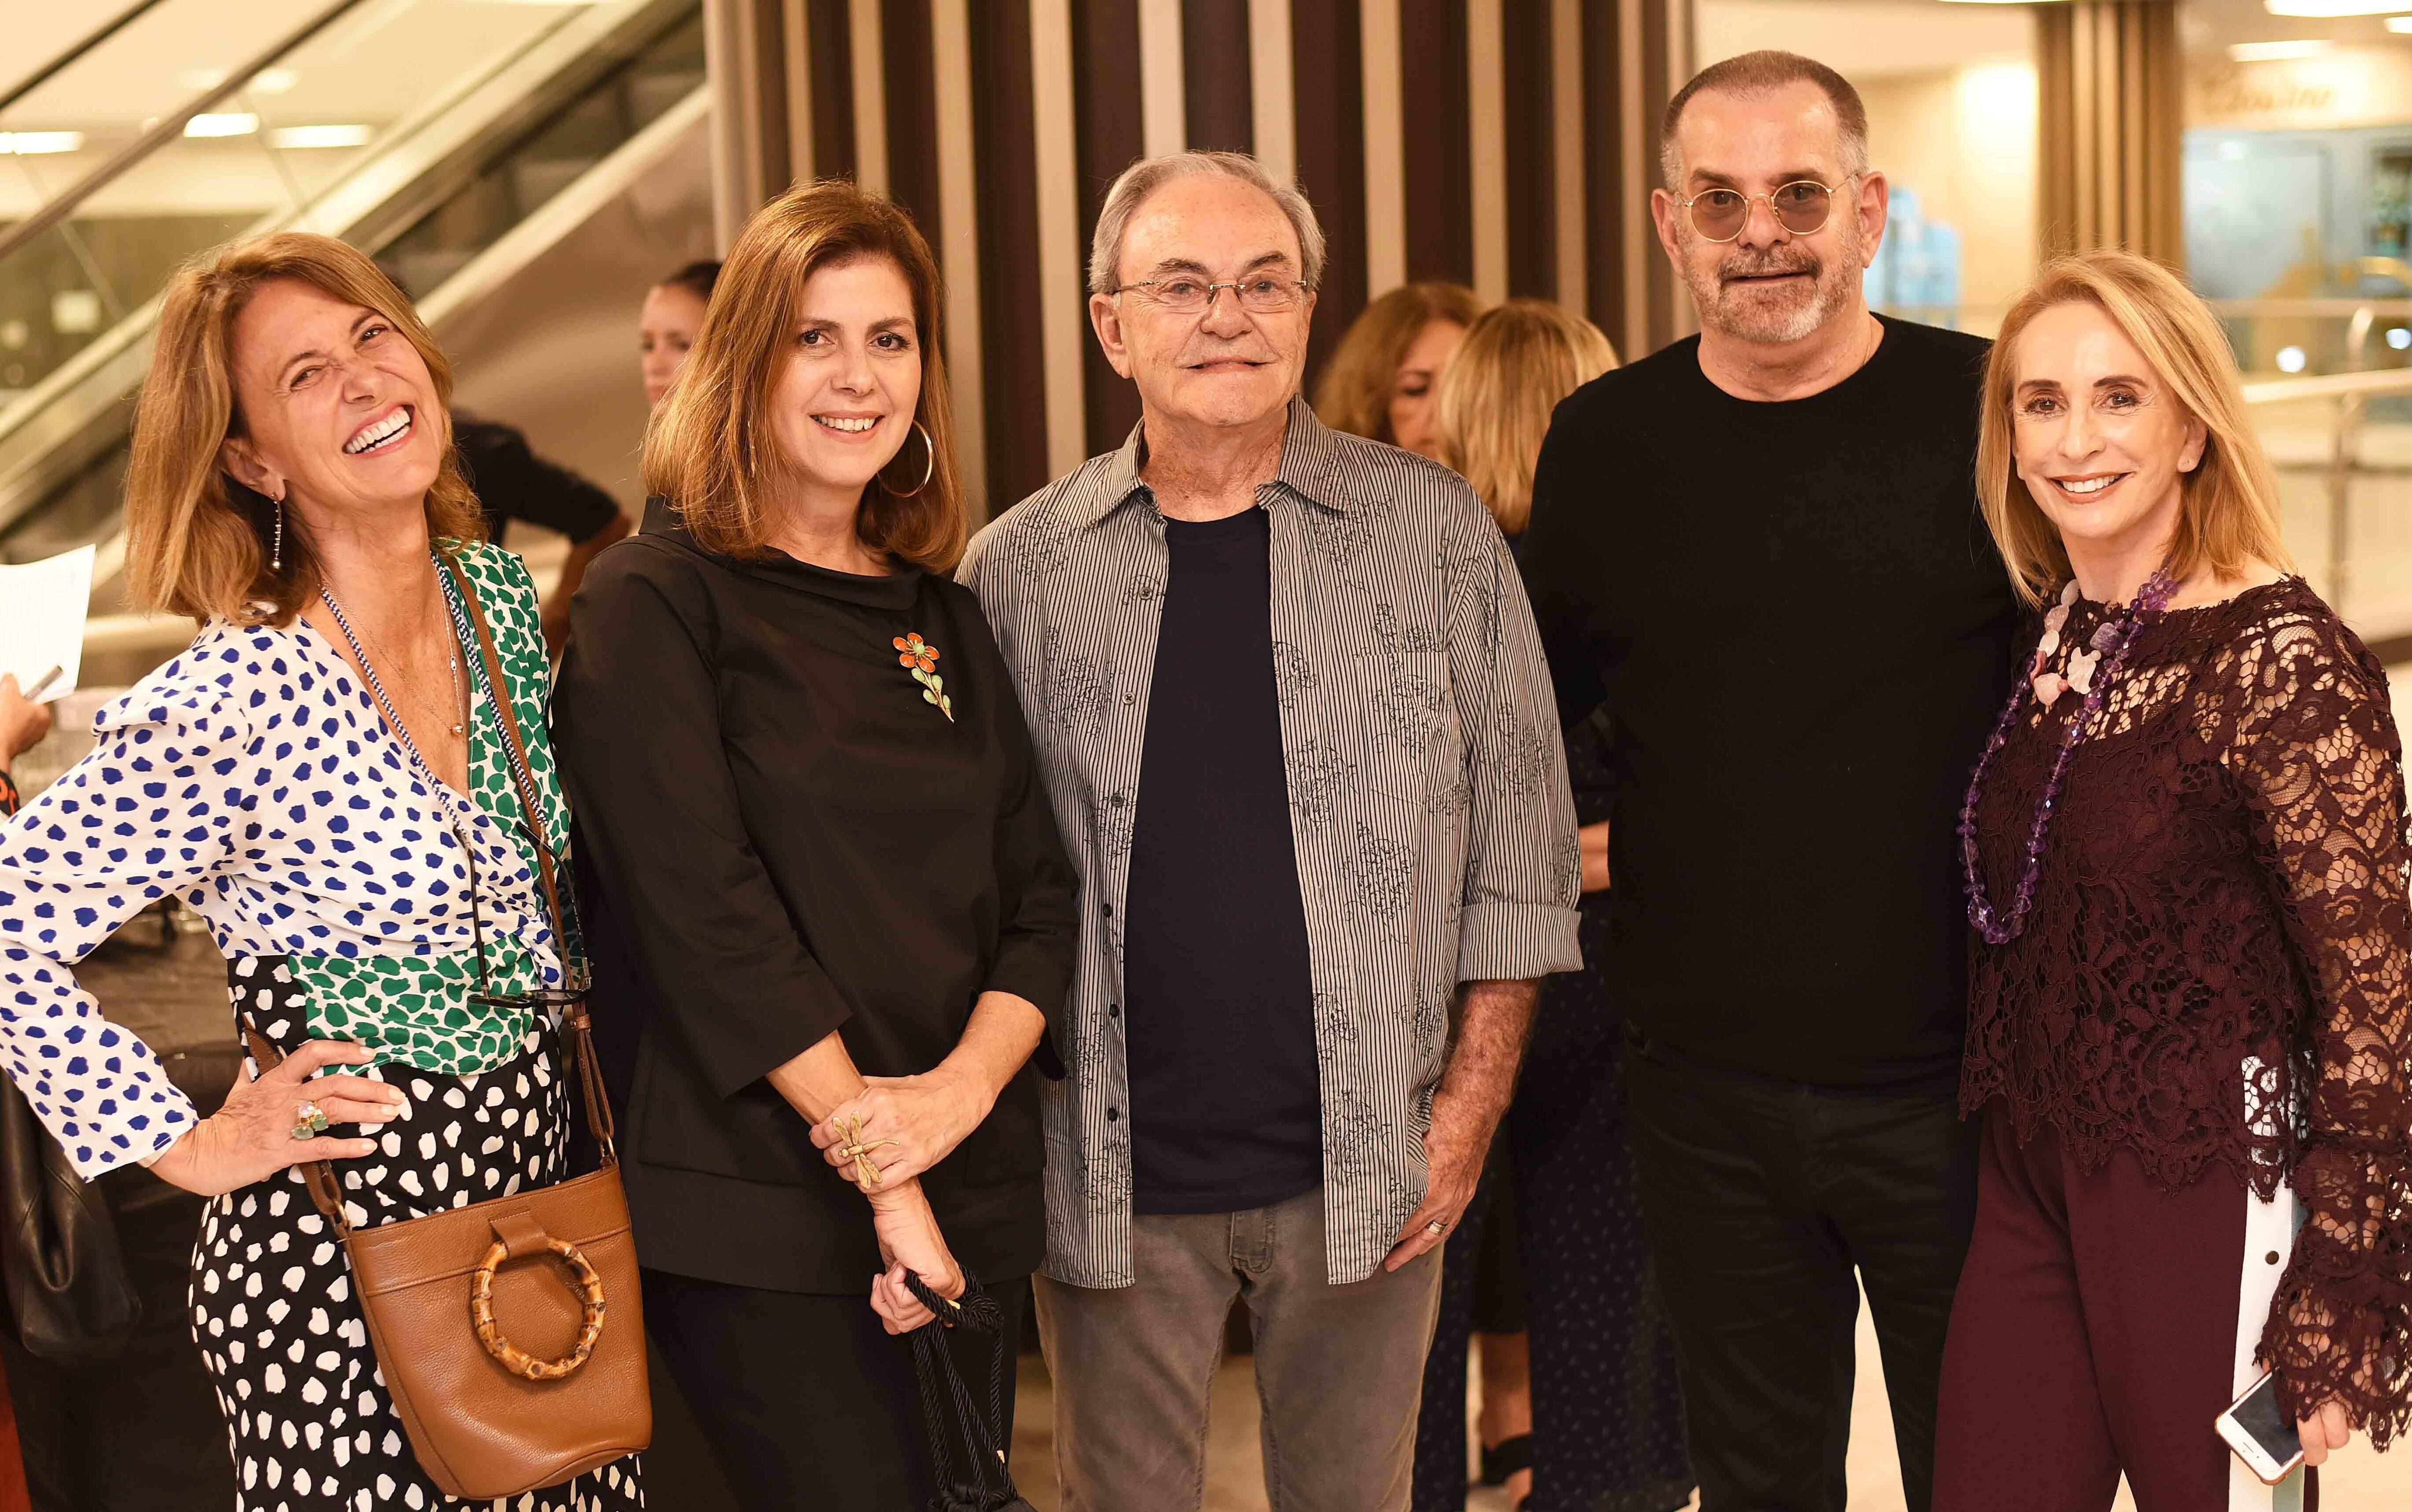 Stella Lutterbach, Naná Paranaguá, Geraldo Lamego, Eduardo Machado e Eliane Benchimol  /Foto: Ari Kaye